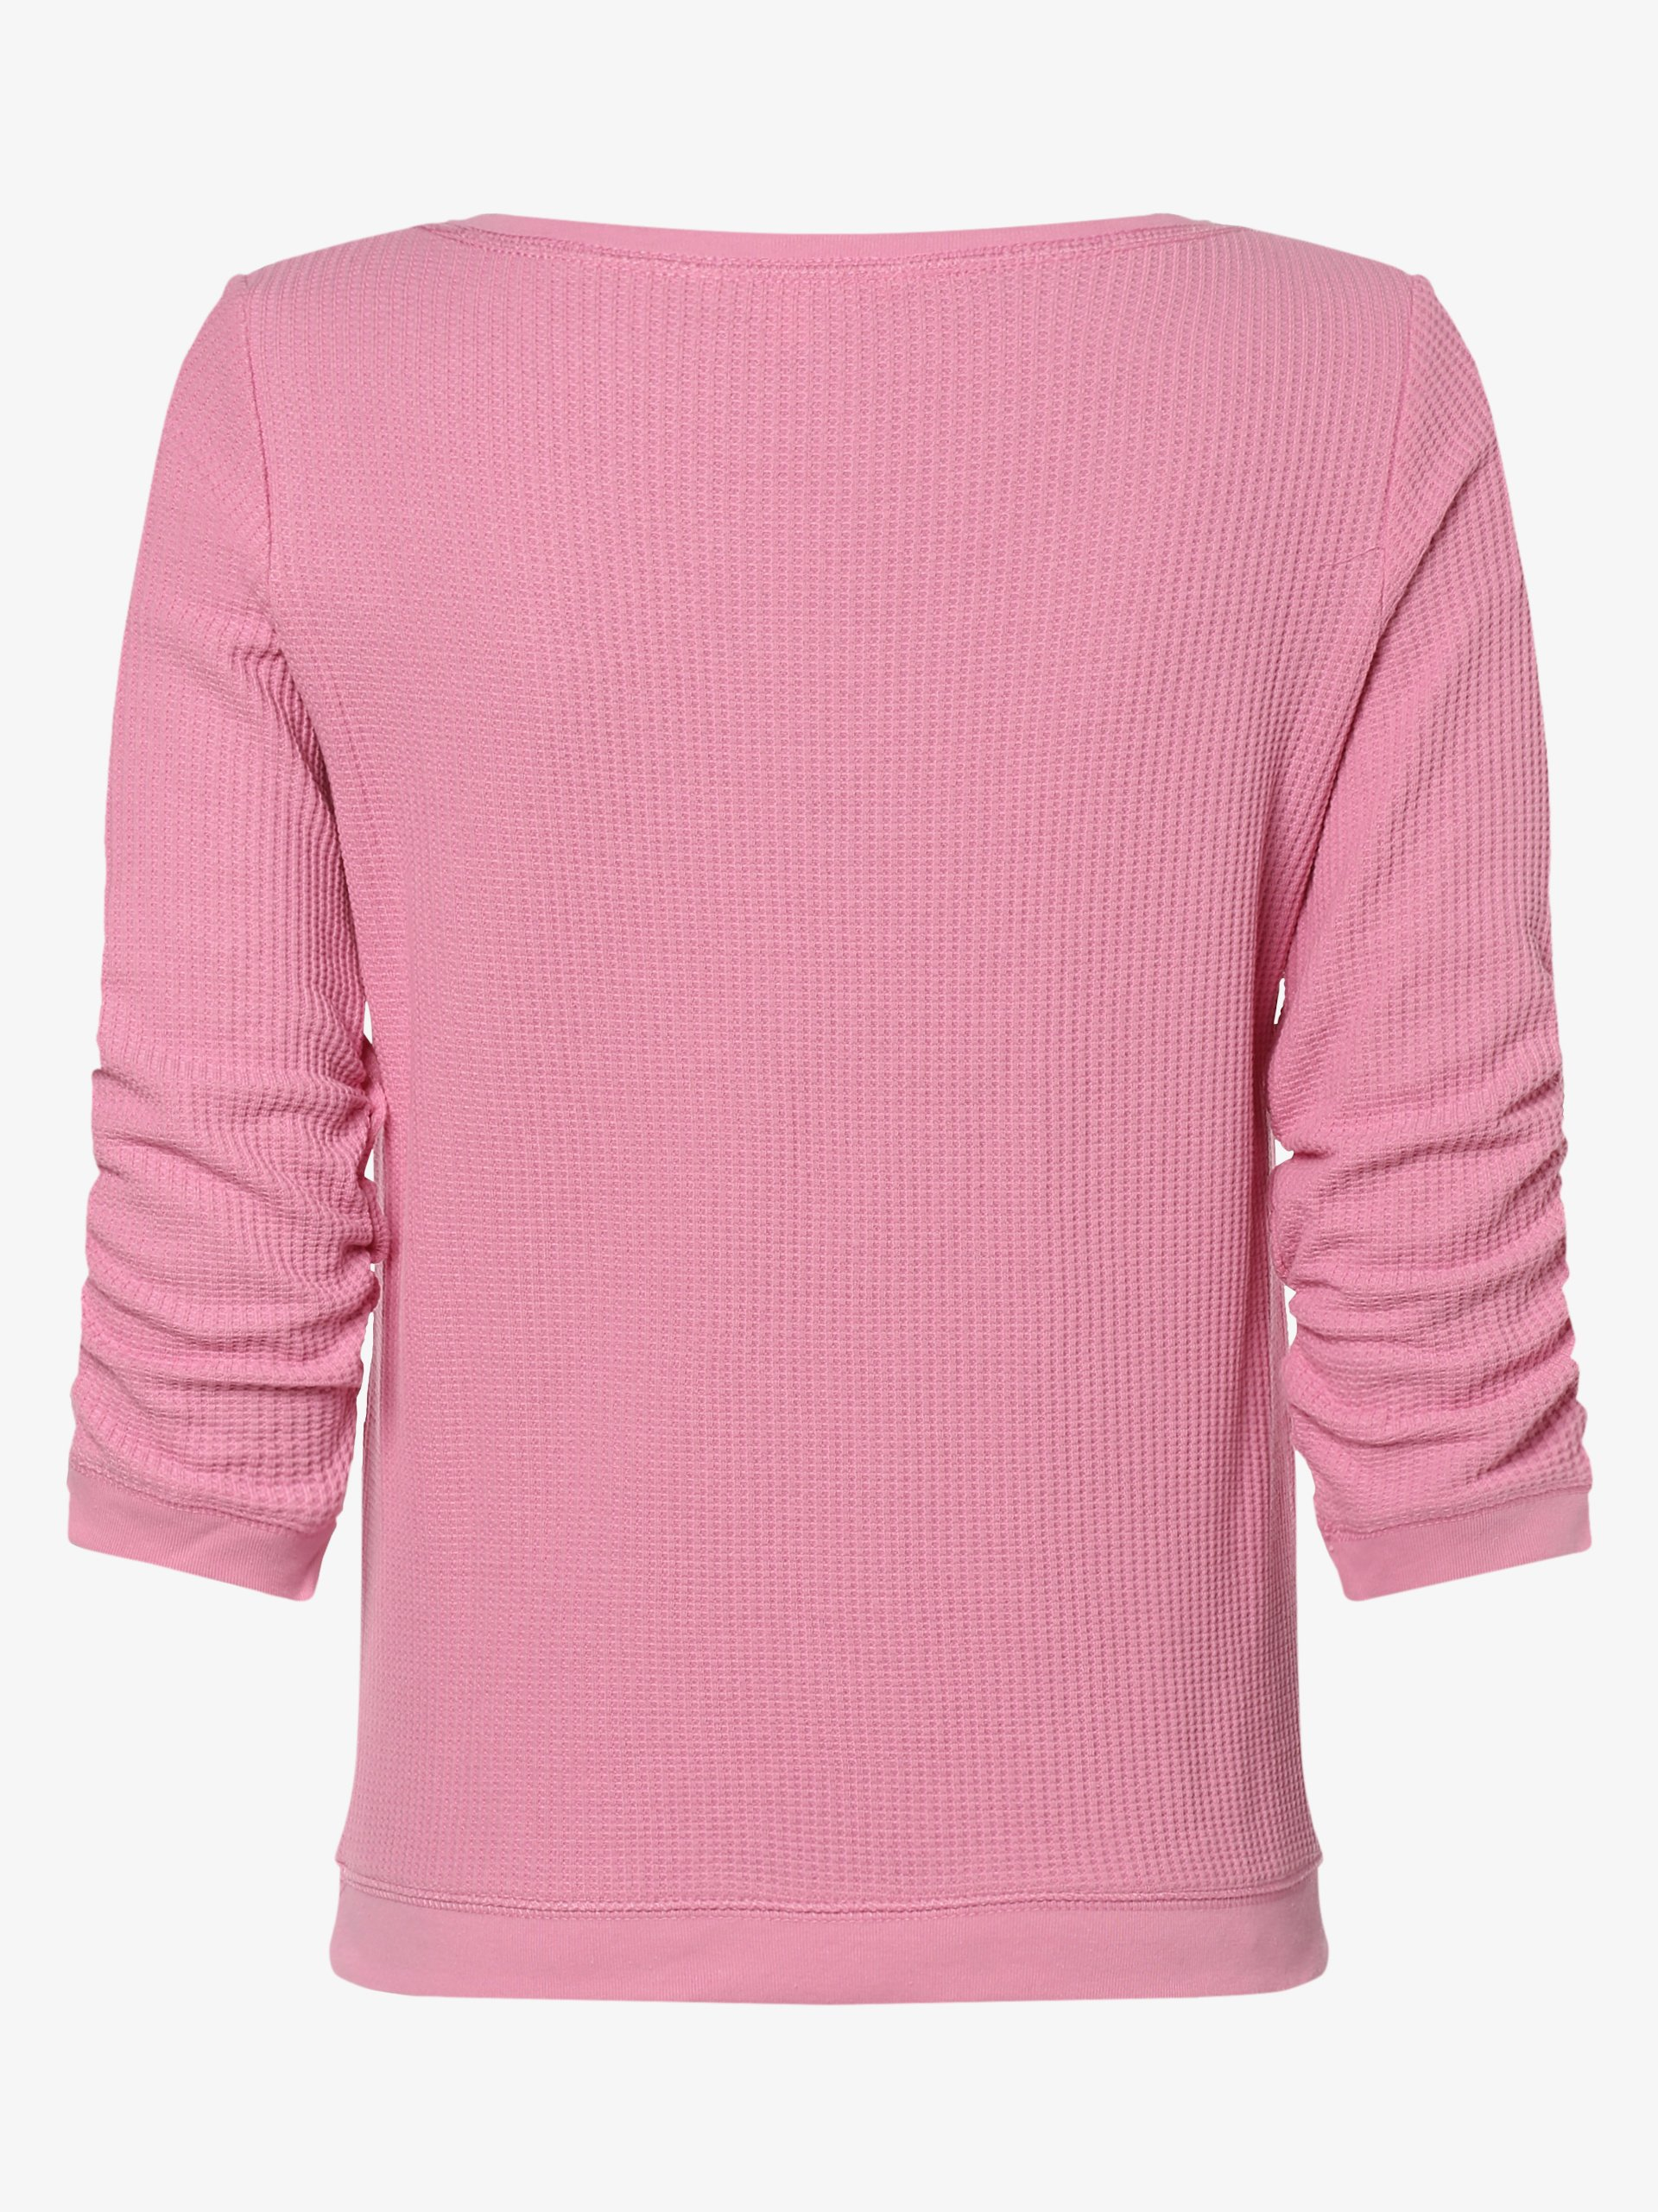 Tom Tailor Denim Damen Shirt